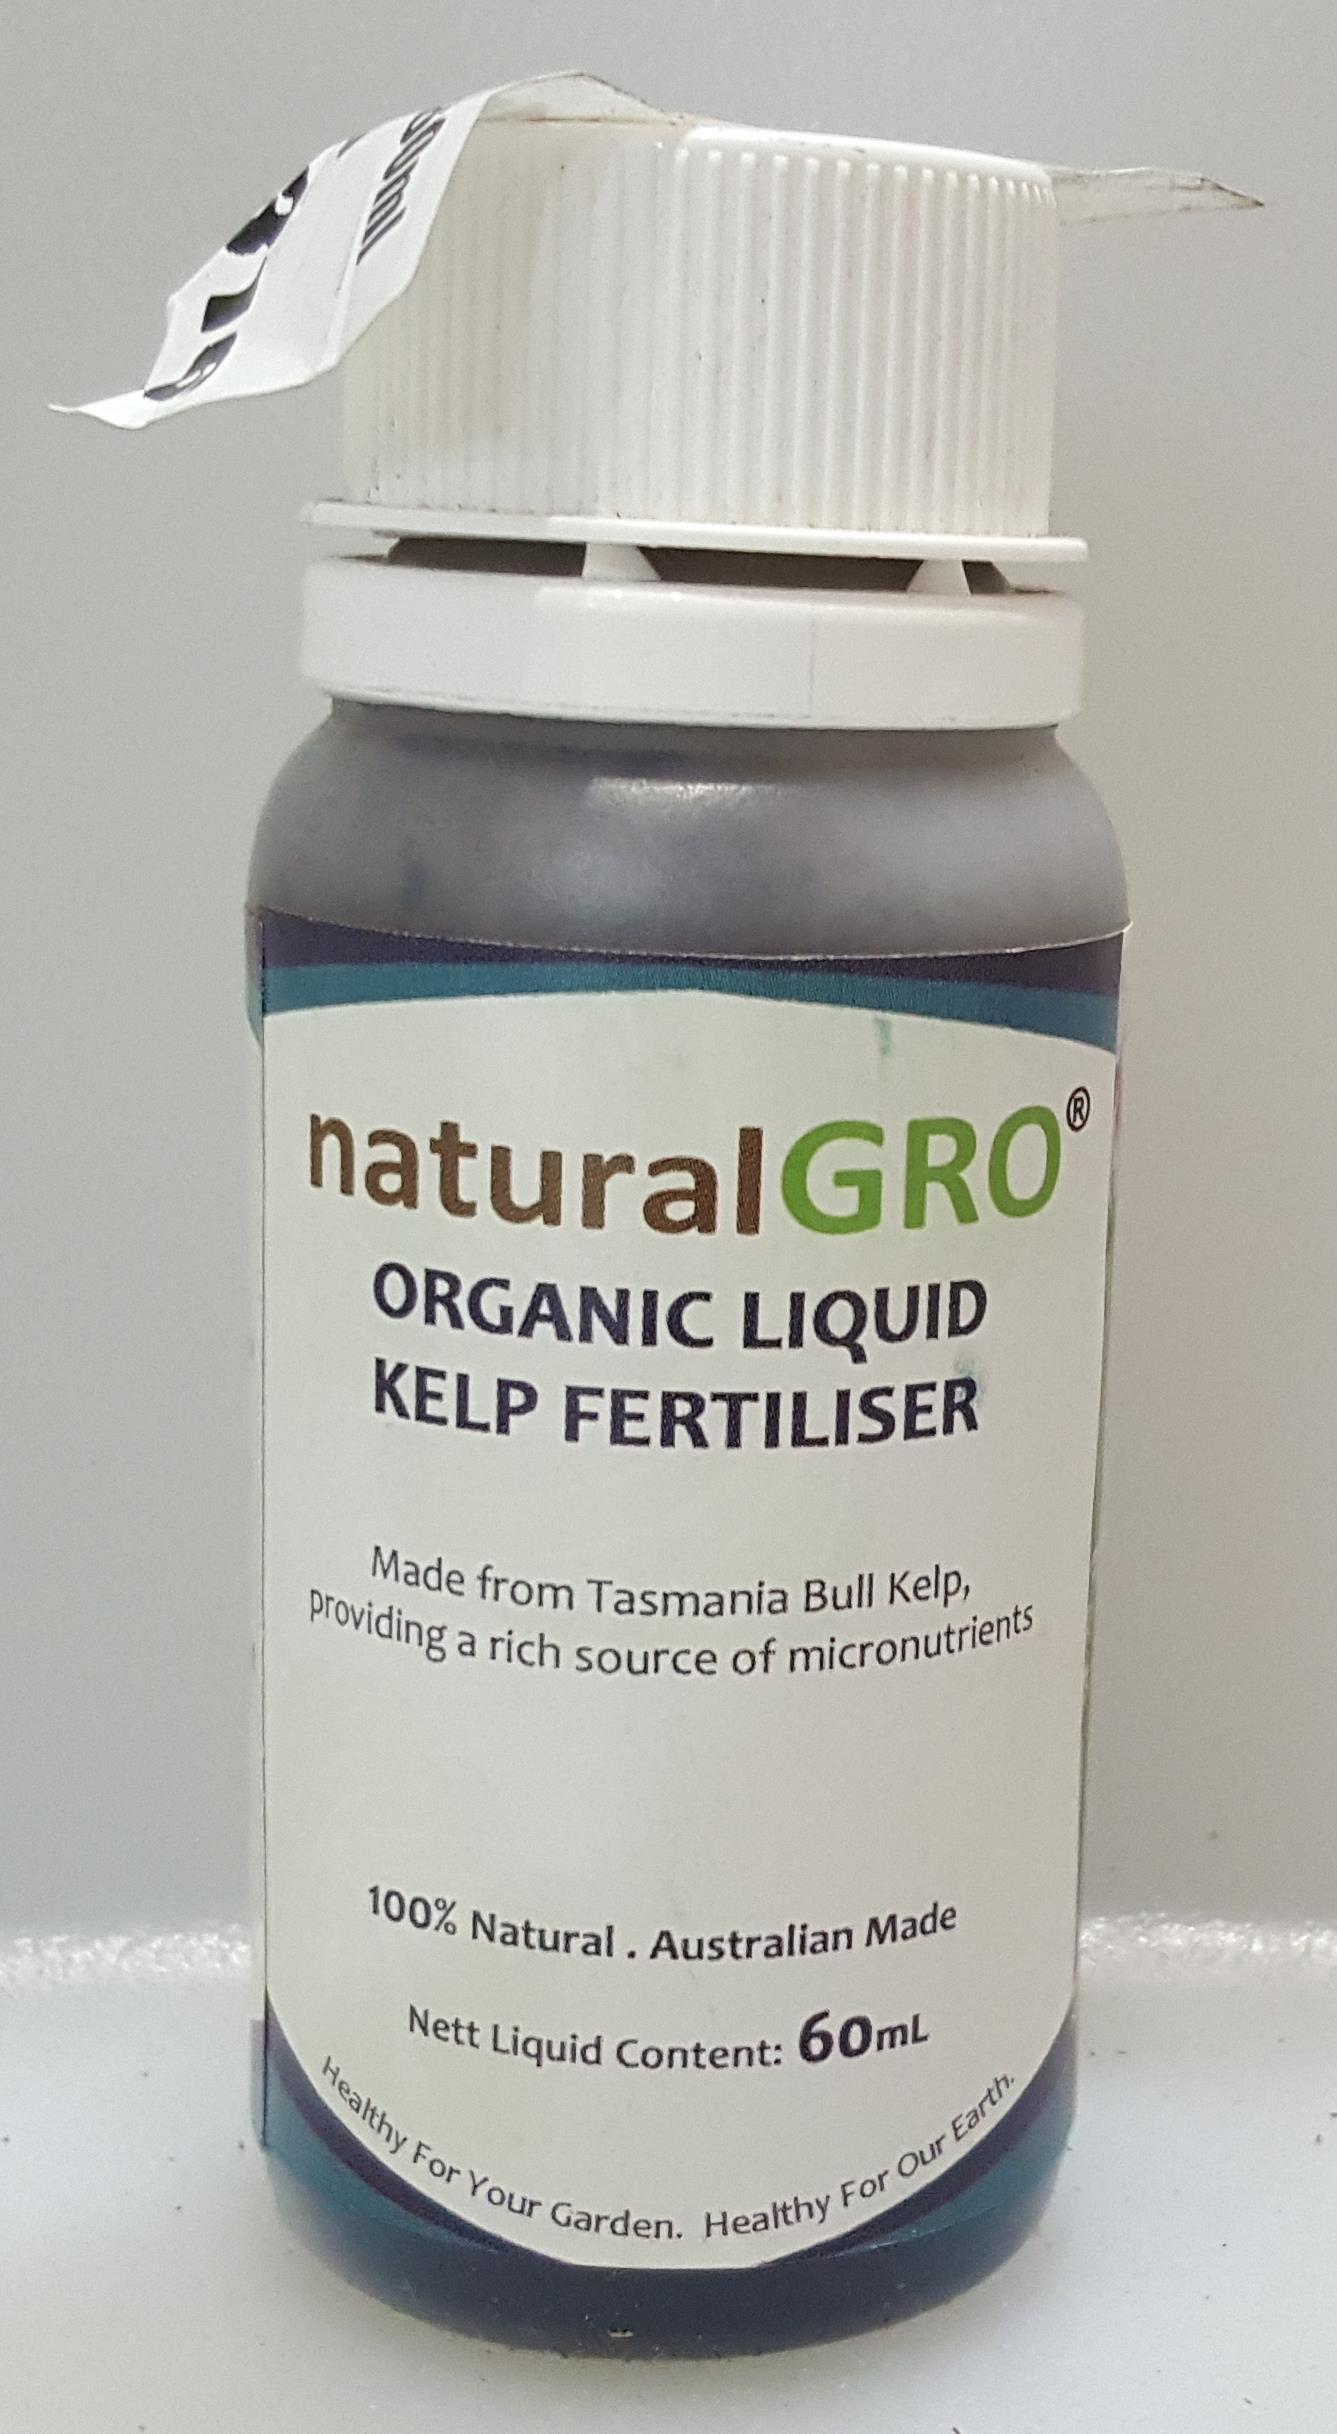 naturalGRO Organic Liquid Kelp Fertiliser 60mL